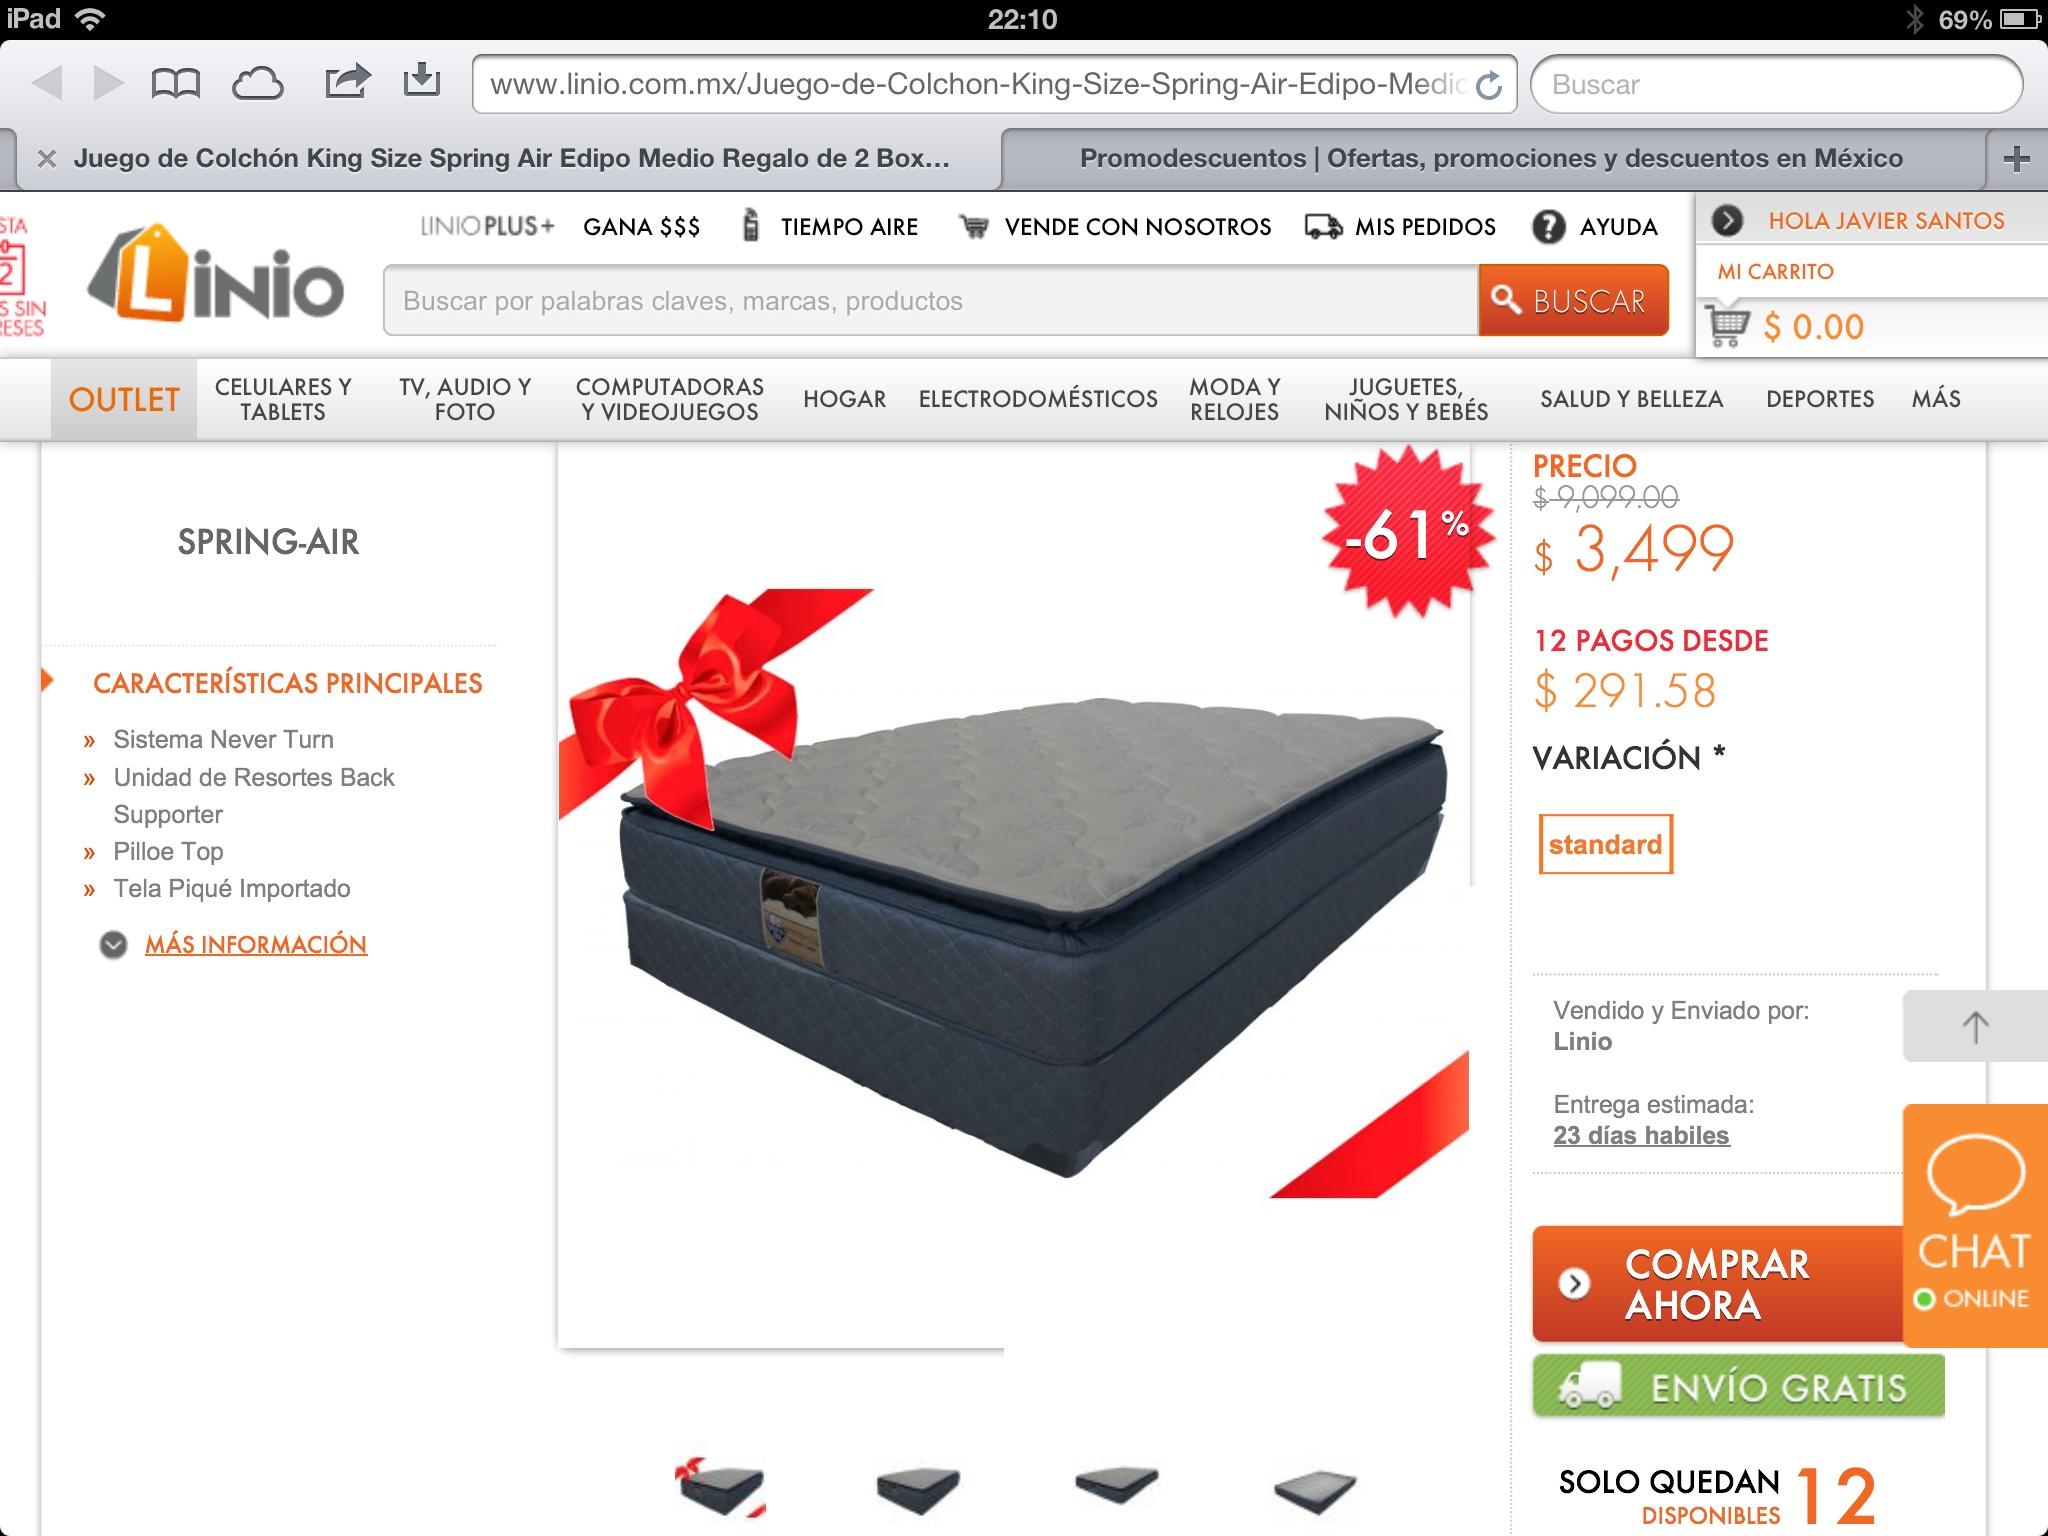 LINIO Colchón Spring Air king size $3,499 con box y envió graits